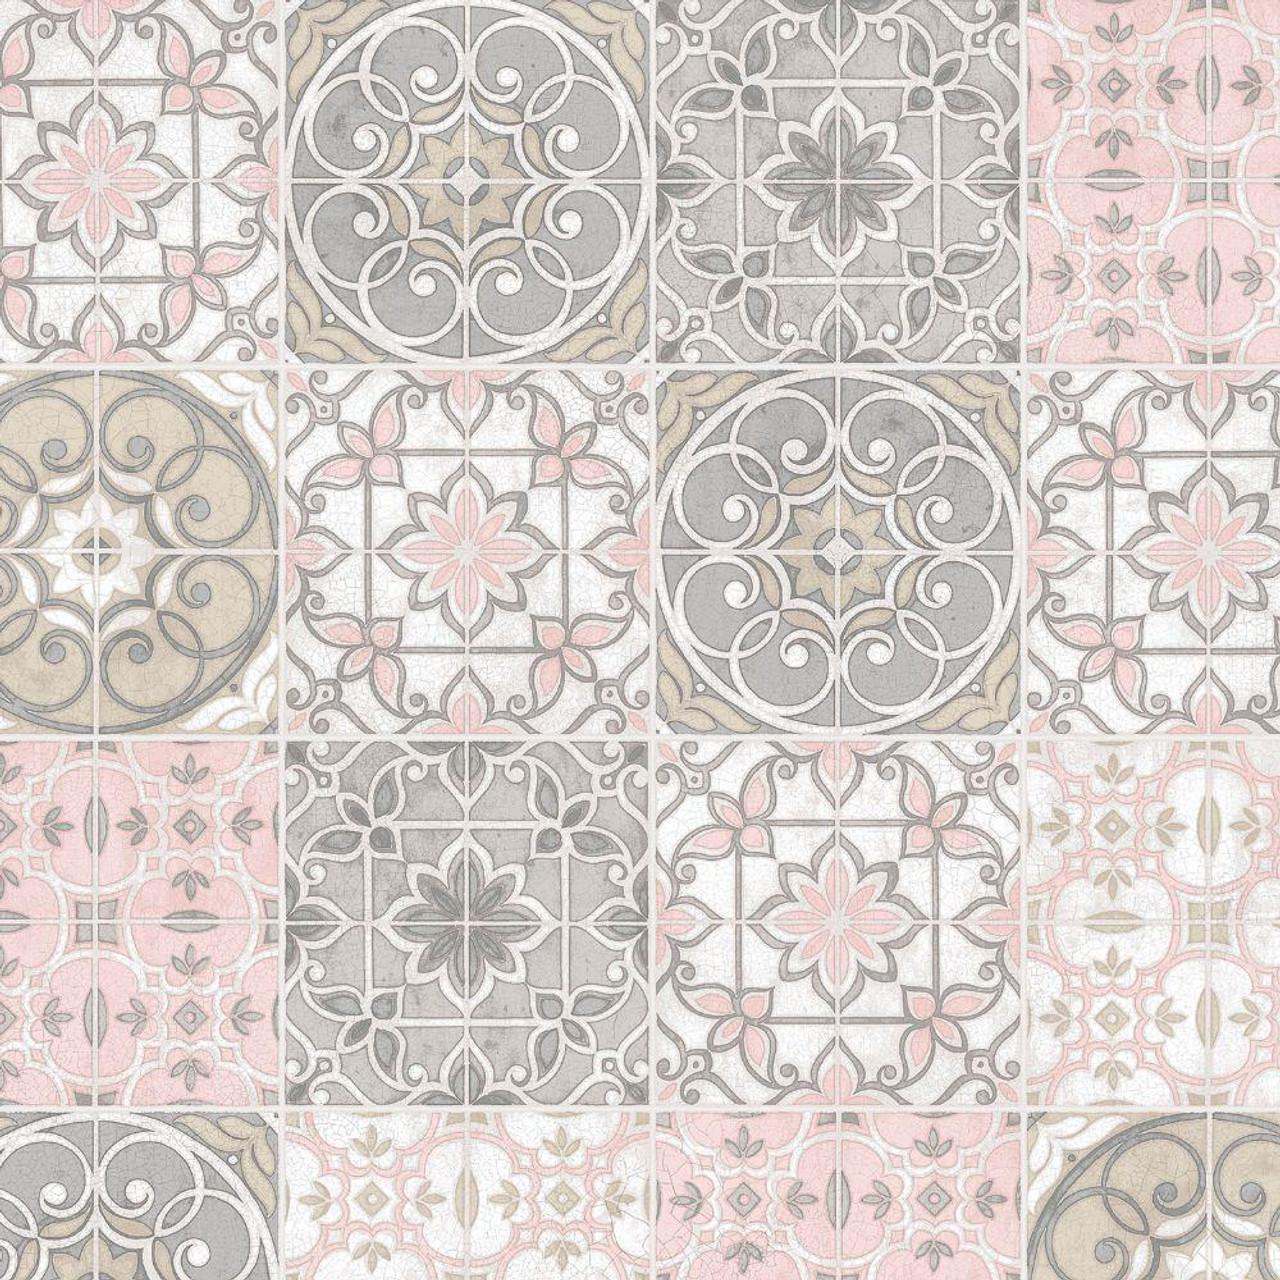 kitchen style 3 ceramic tile wallpaper ck36611 pink grey